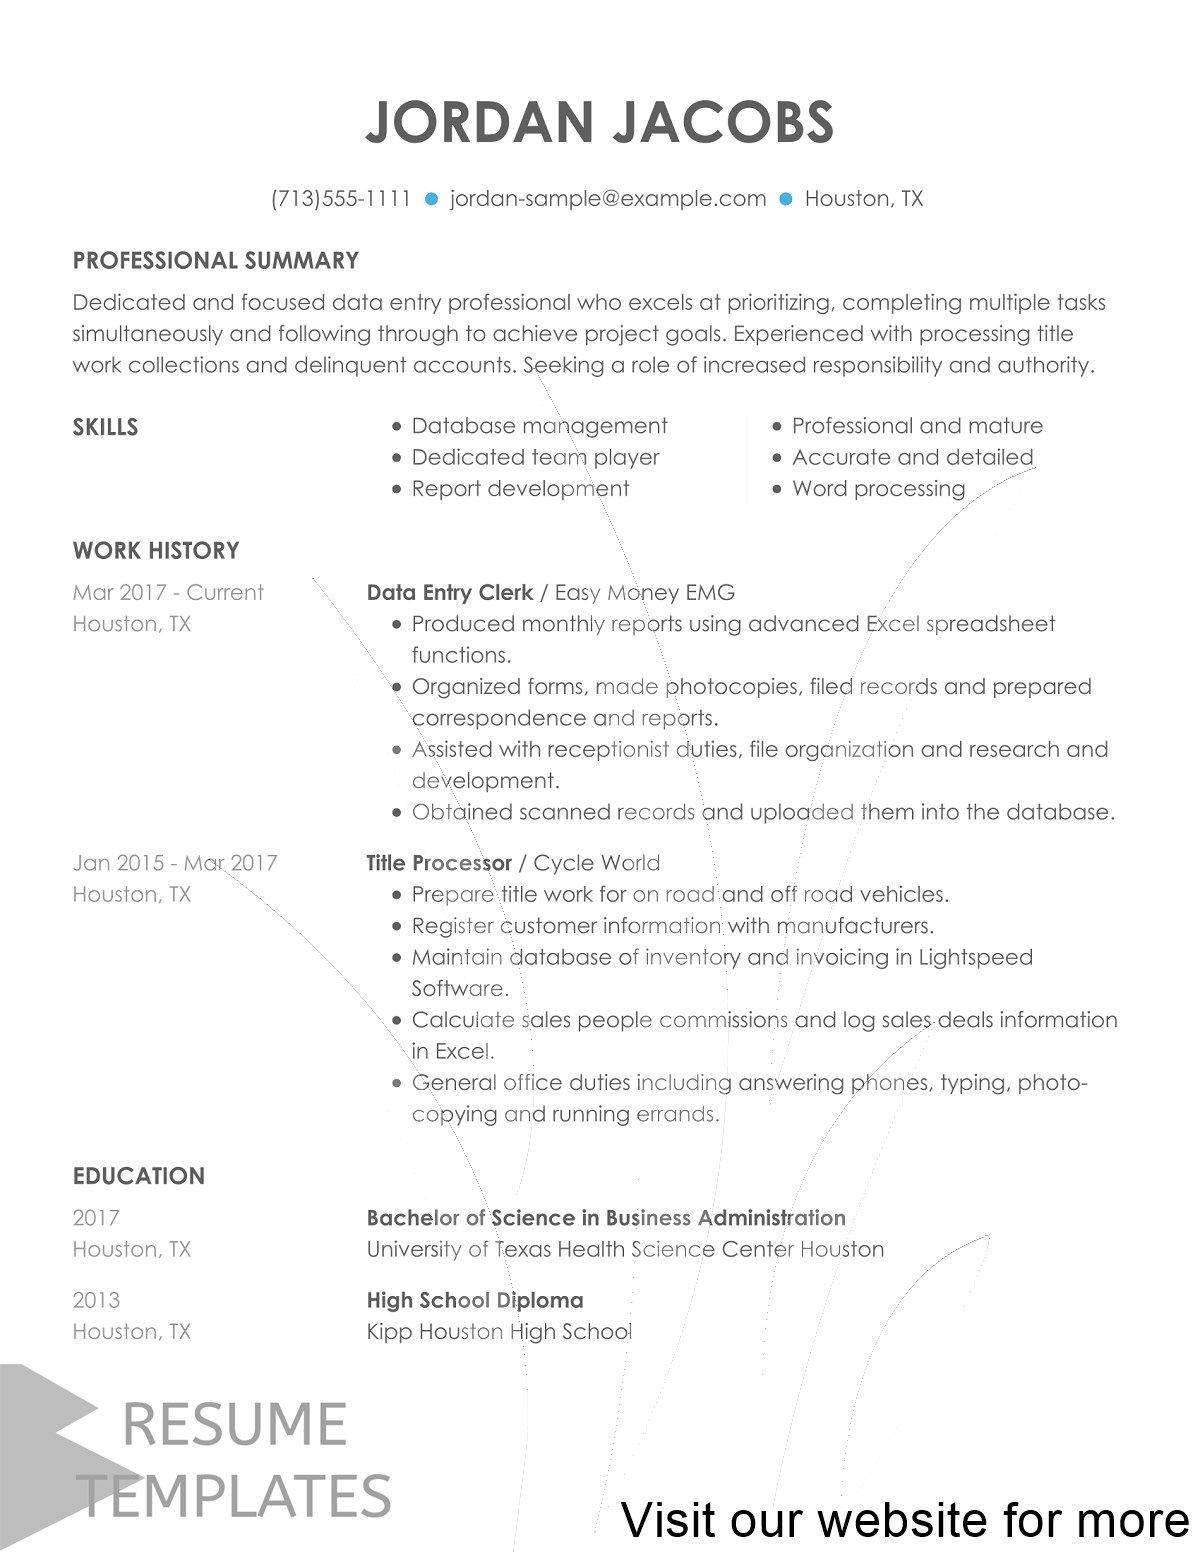 resume template customer service in 2020 Resume template